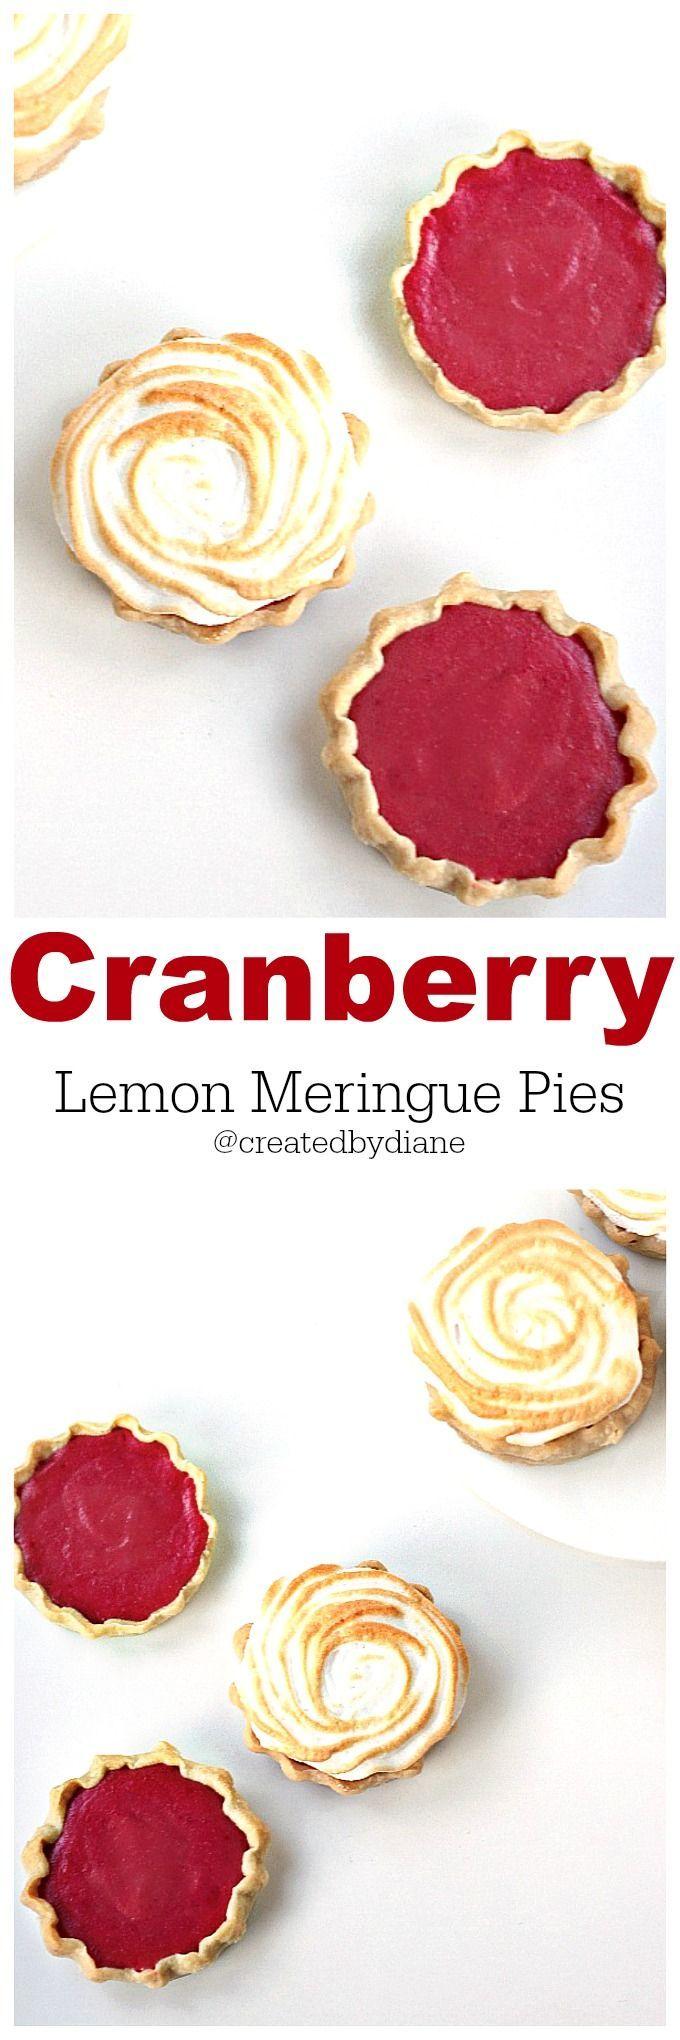 CRANBERRY Lemon Meringue Pies http://www.createdby-diane.com /createdbydiane/